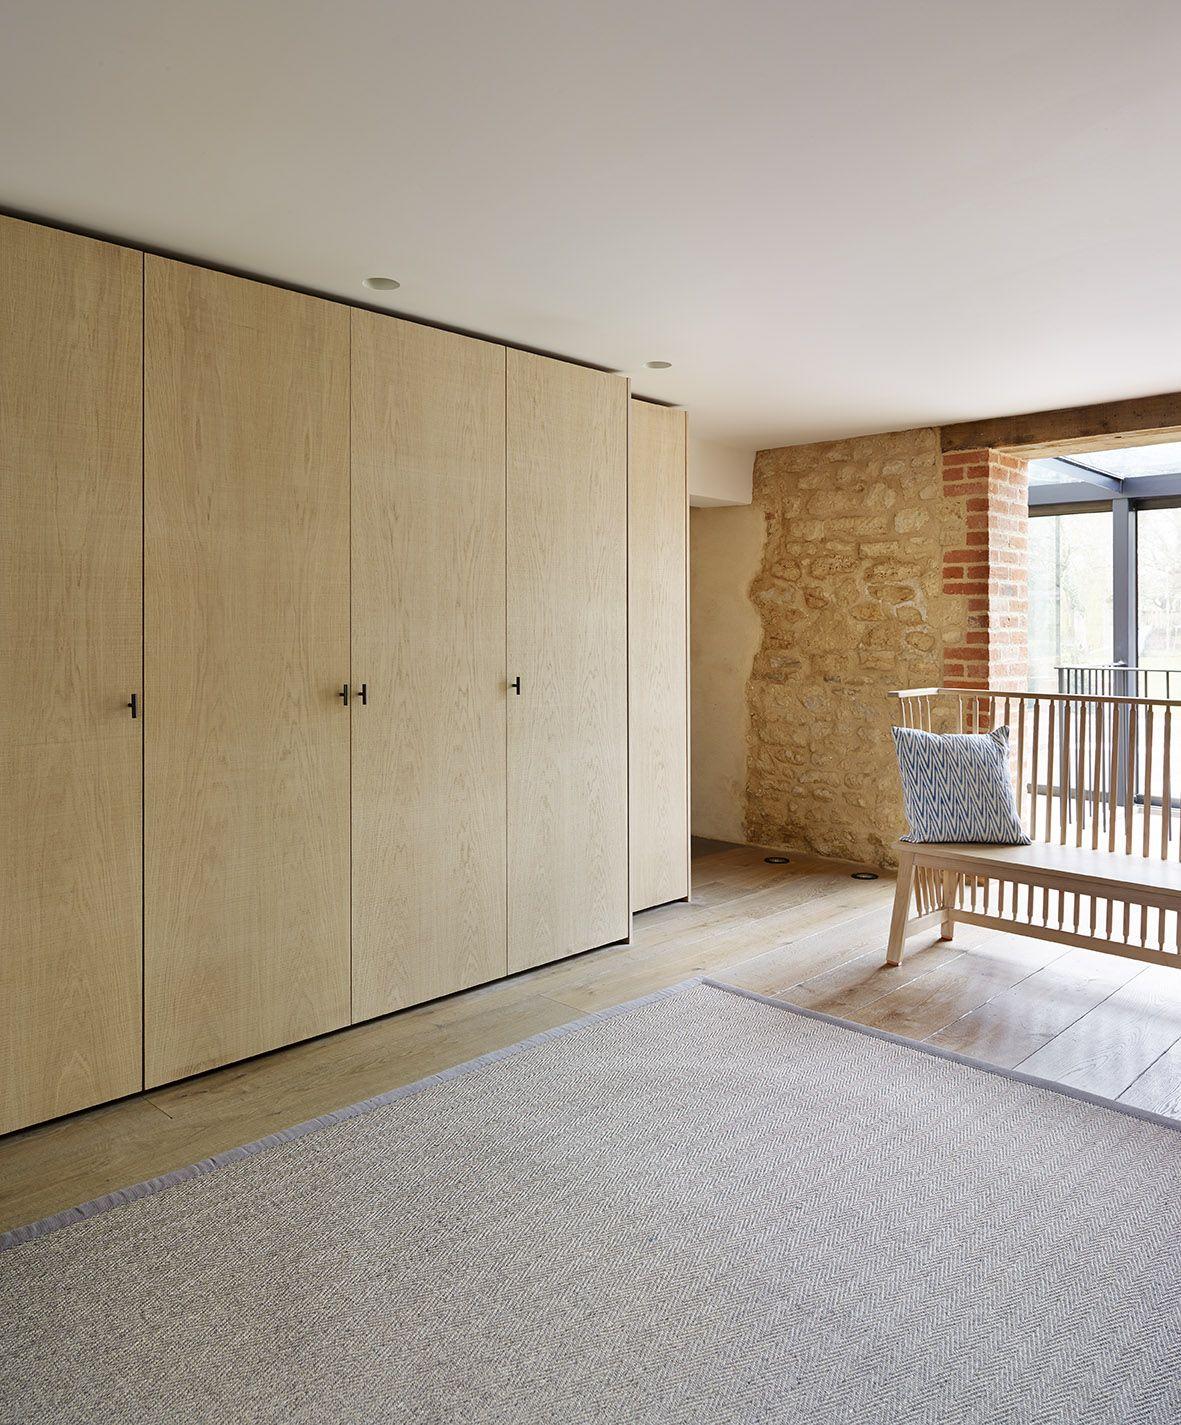 Luxury hallway furniture  Bespoke  Entrance Hall Furniture by Teddy Edwards handcrafted